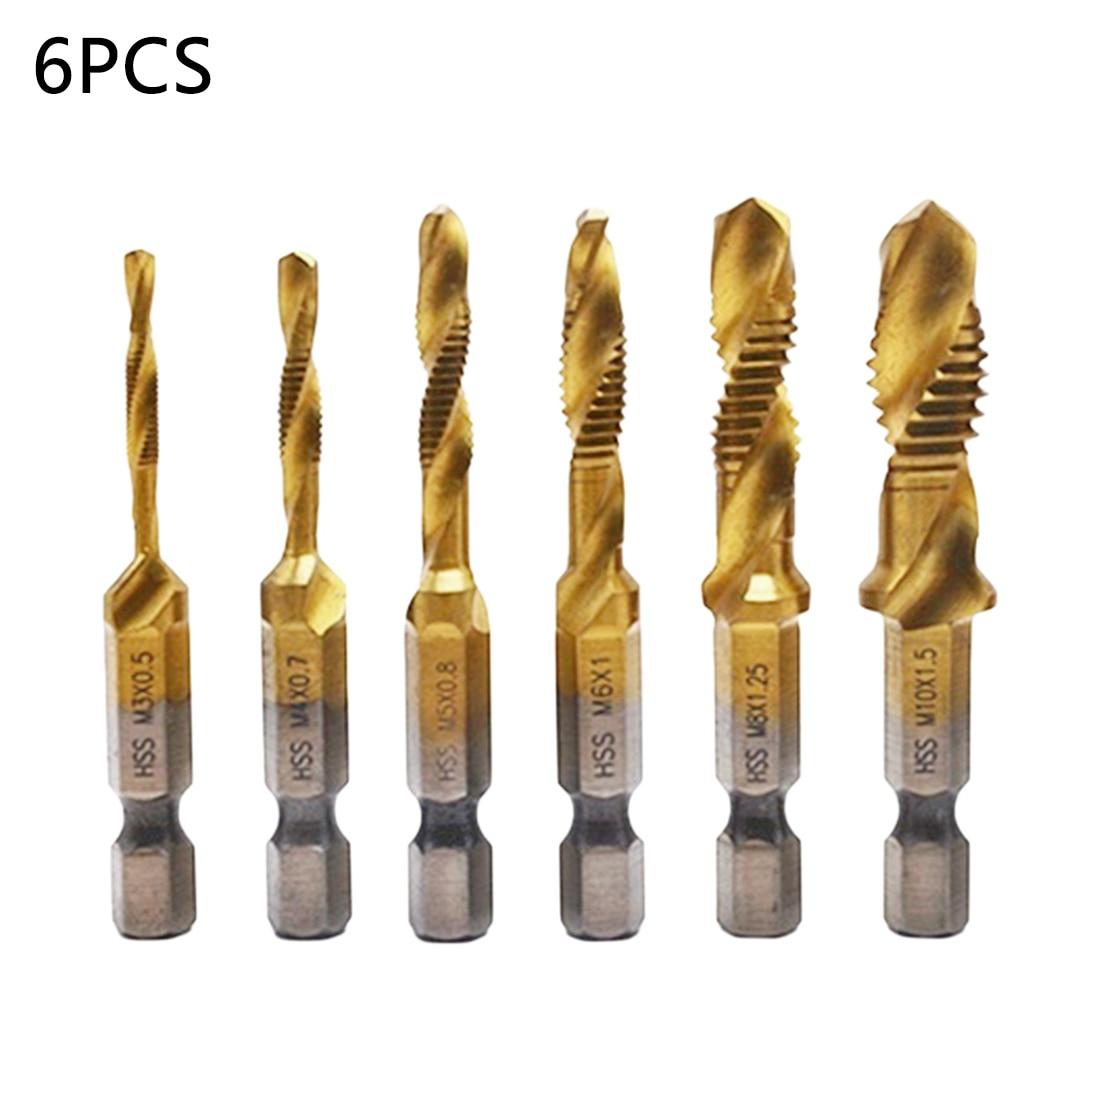 6pcs/set 1/4'' Hex Shank HSS High Speed Steel Thread Spiral Screw Metric Composite Tap Drill Bit Set Tap M3 M4 M5 M6 M8 M10